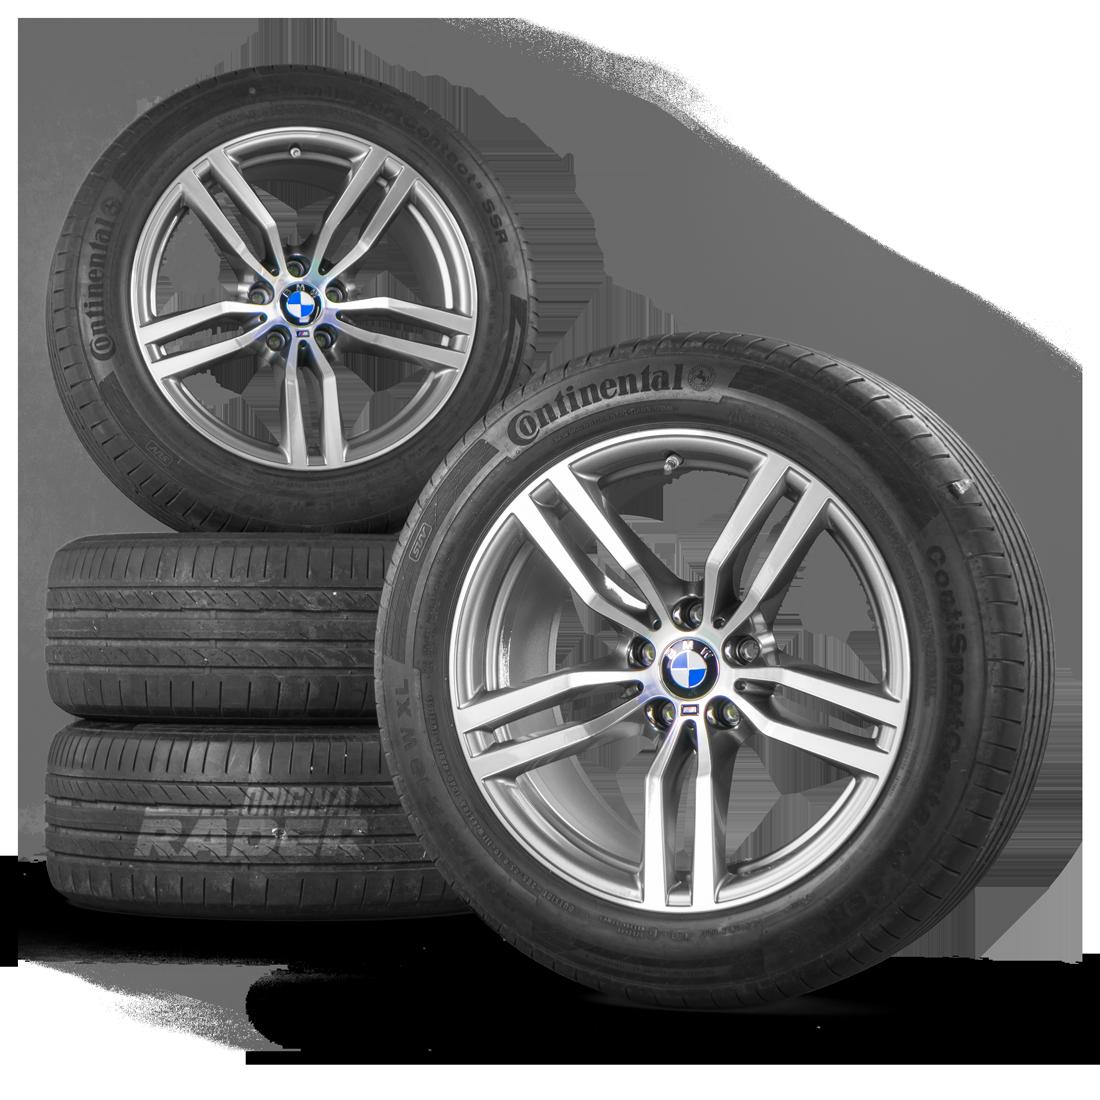 Bmw X6 Styling: BMW 19 Zoll X6 F16 Styling M623 M 623 Alufelgen Original